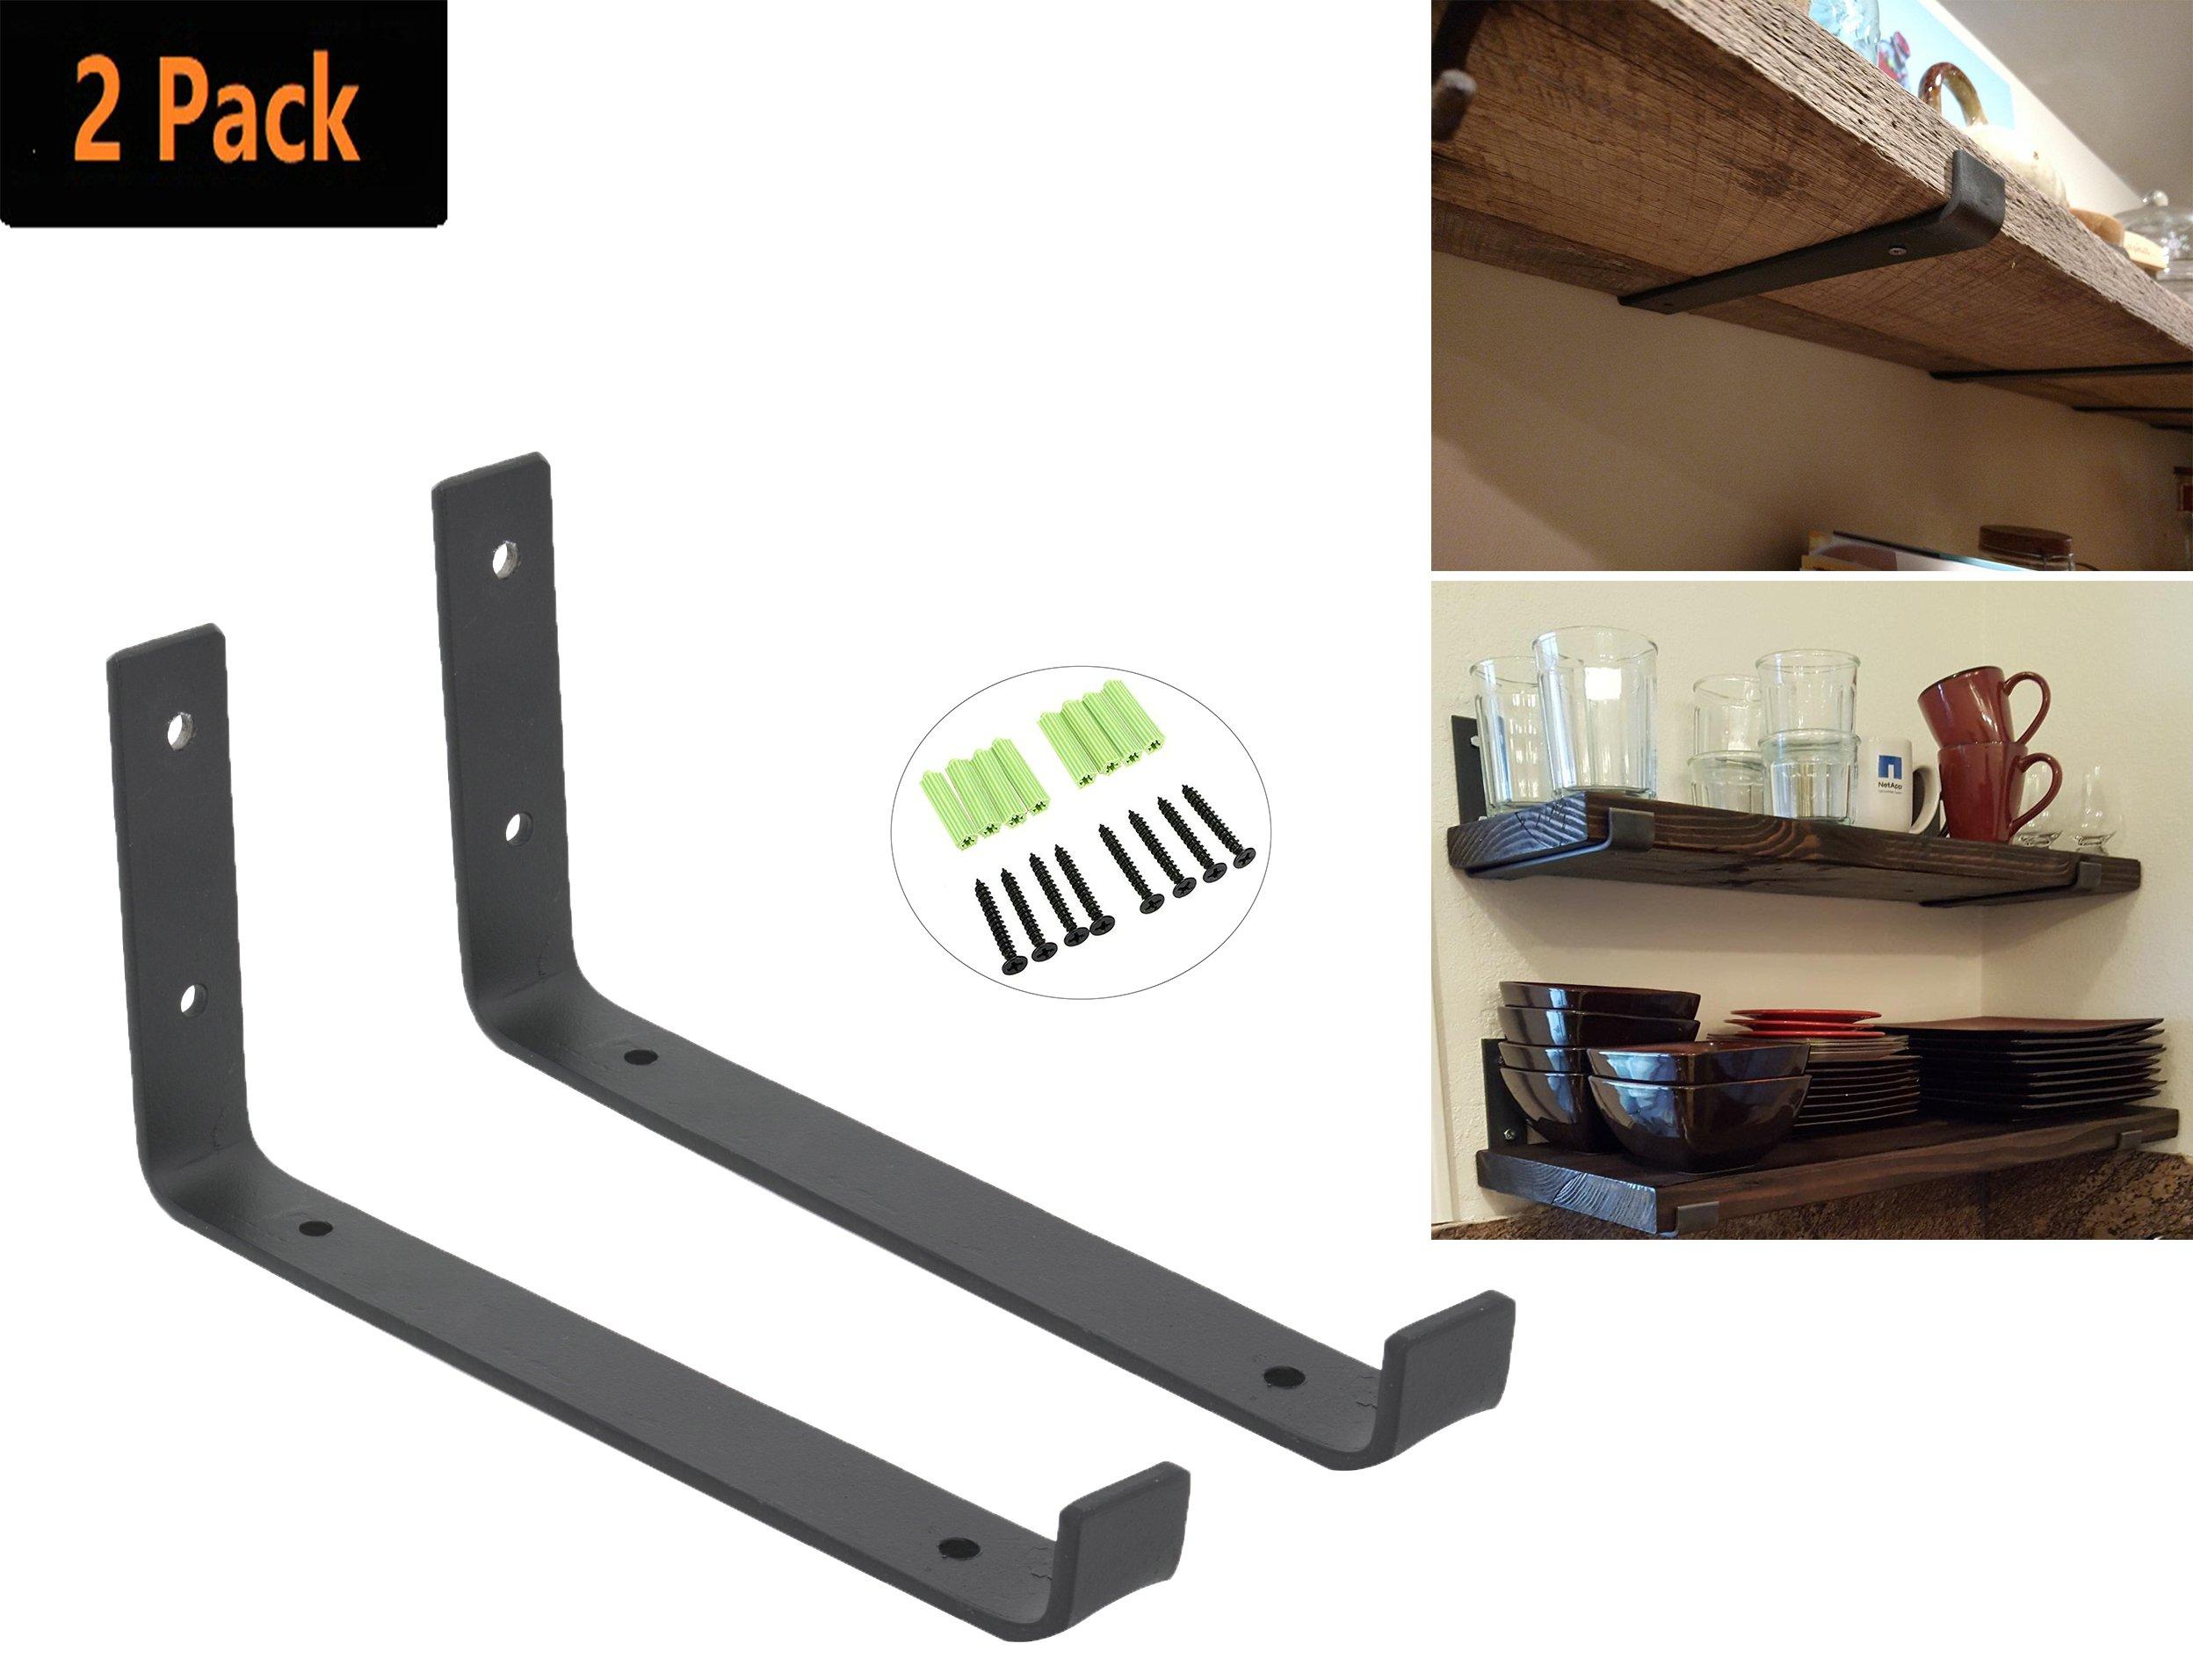 Addgrace Hook Brackets Handcrafted Forged Rustic Metal Wall Shelf Brackets Strap Angle Lip Black 8 Inch Amazon Ca Home Kitchen